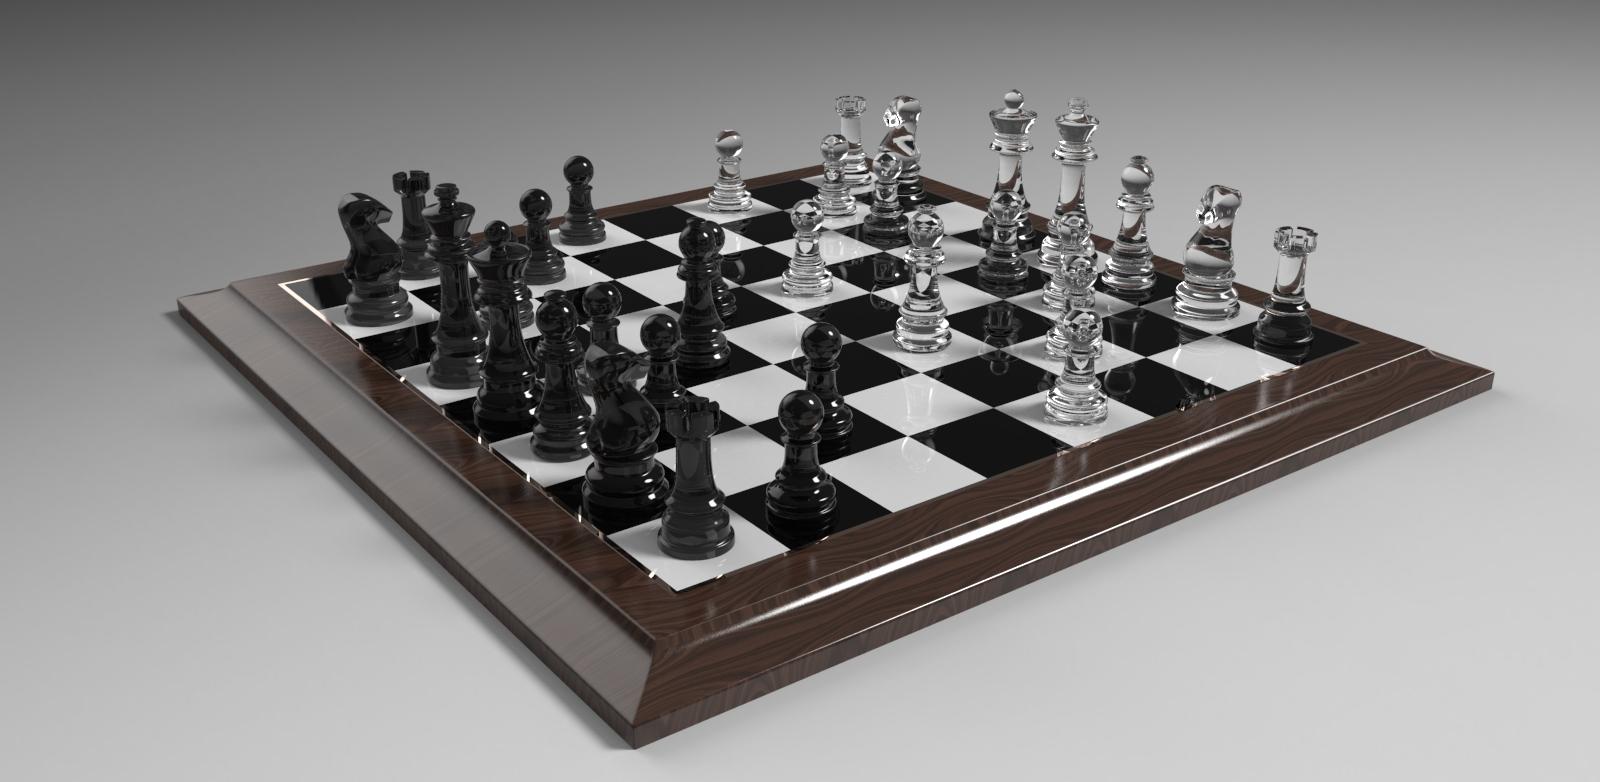 Sharks with jetpacks november 2012 - Chess nice image ...